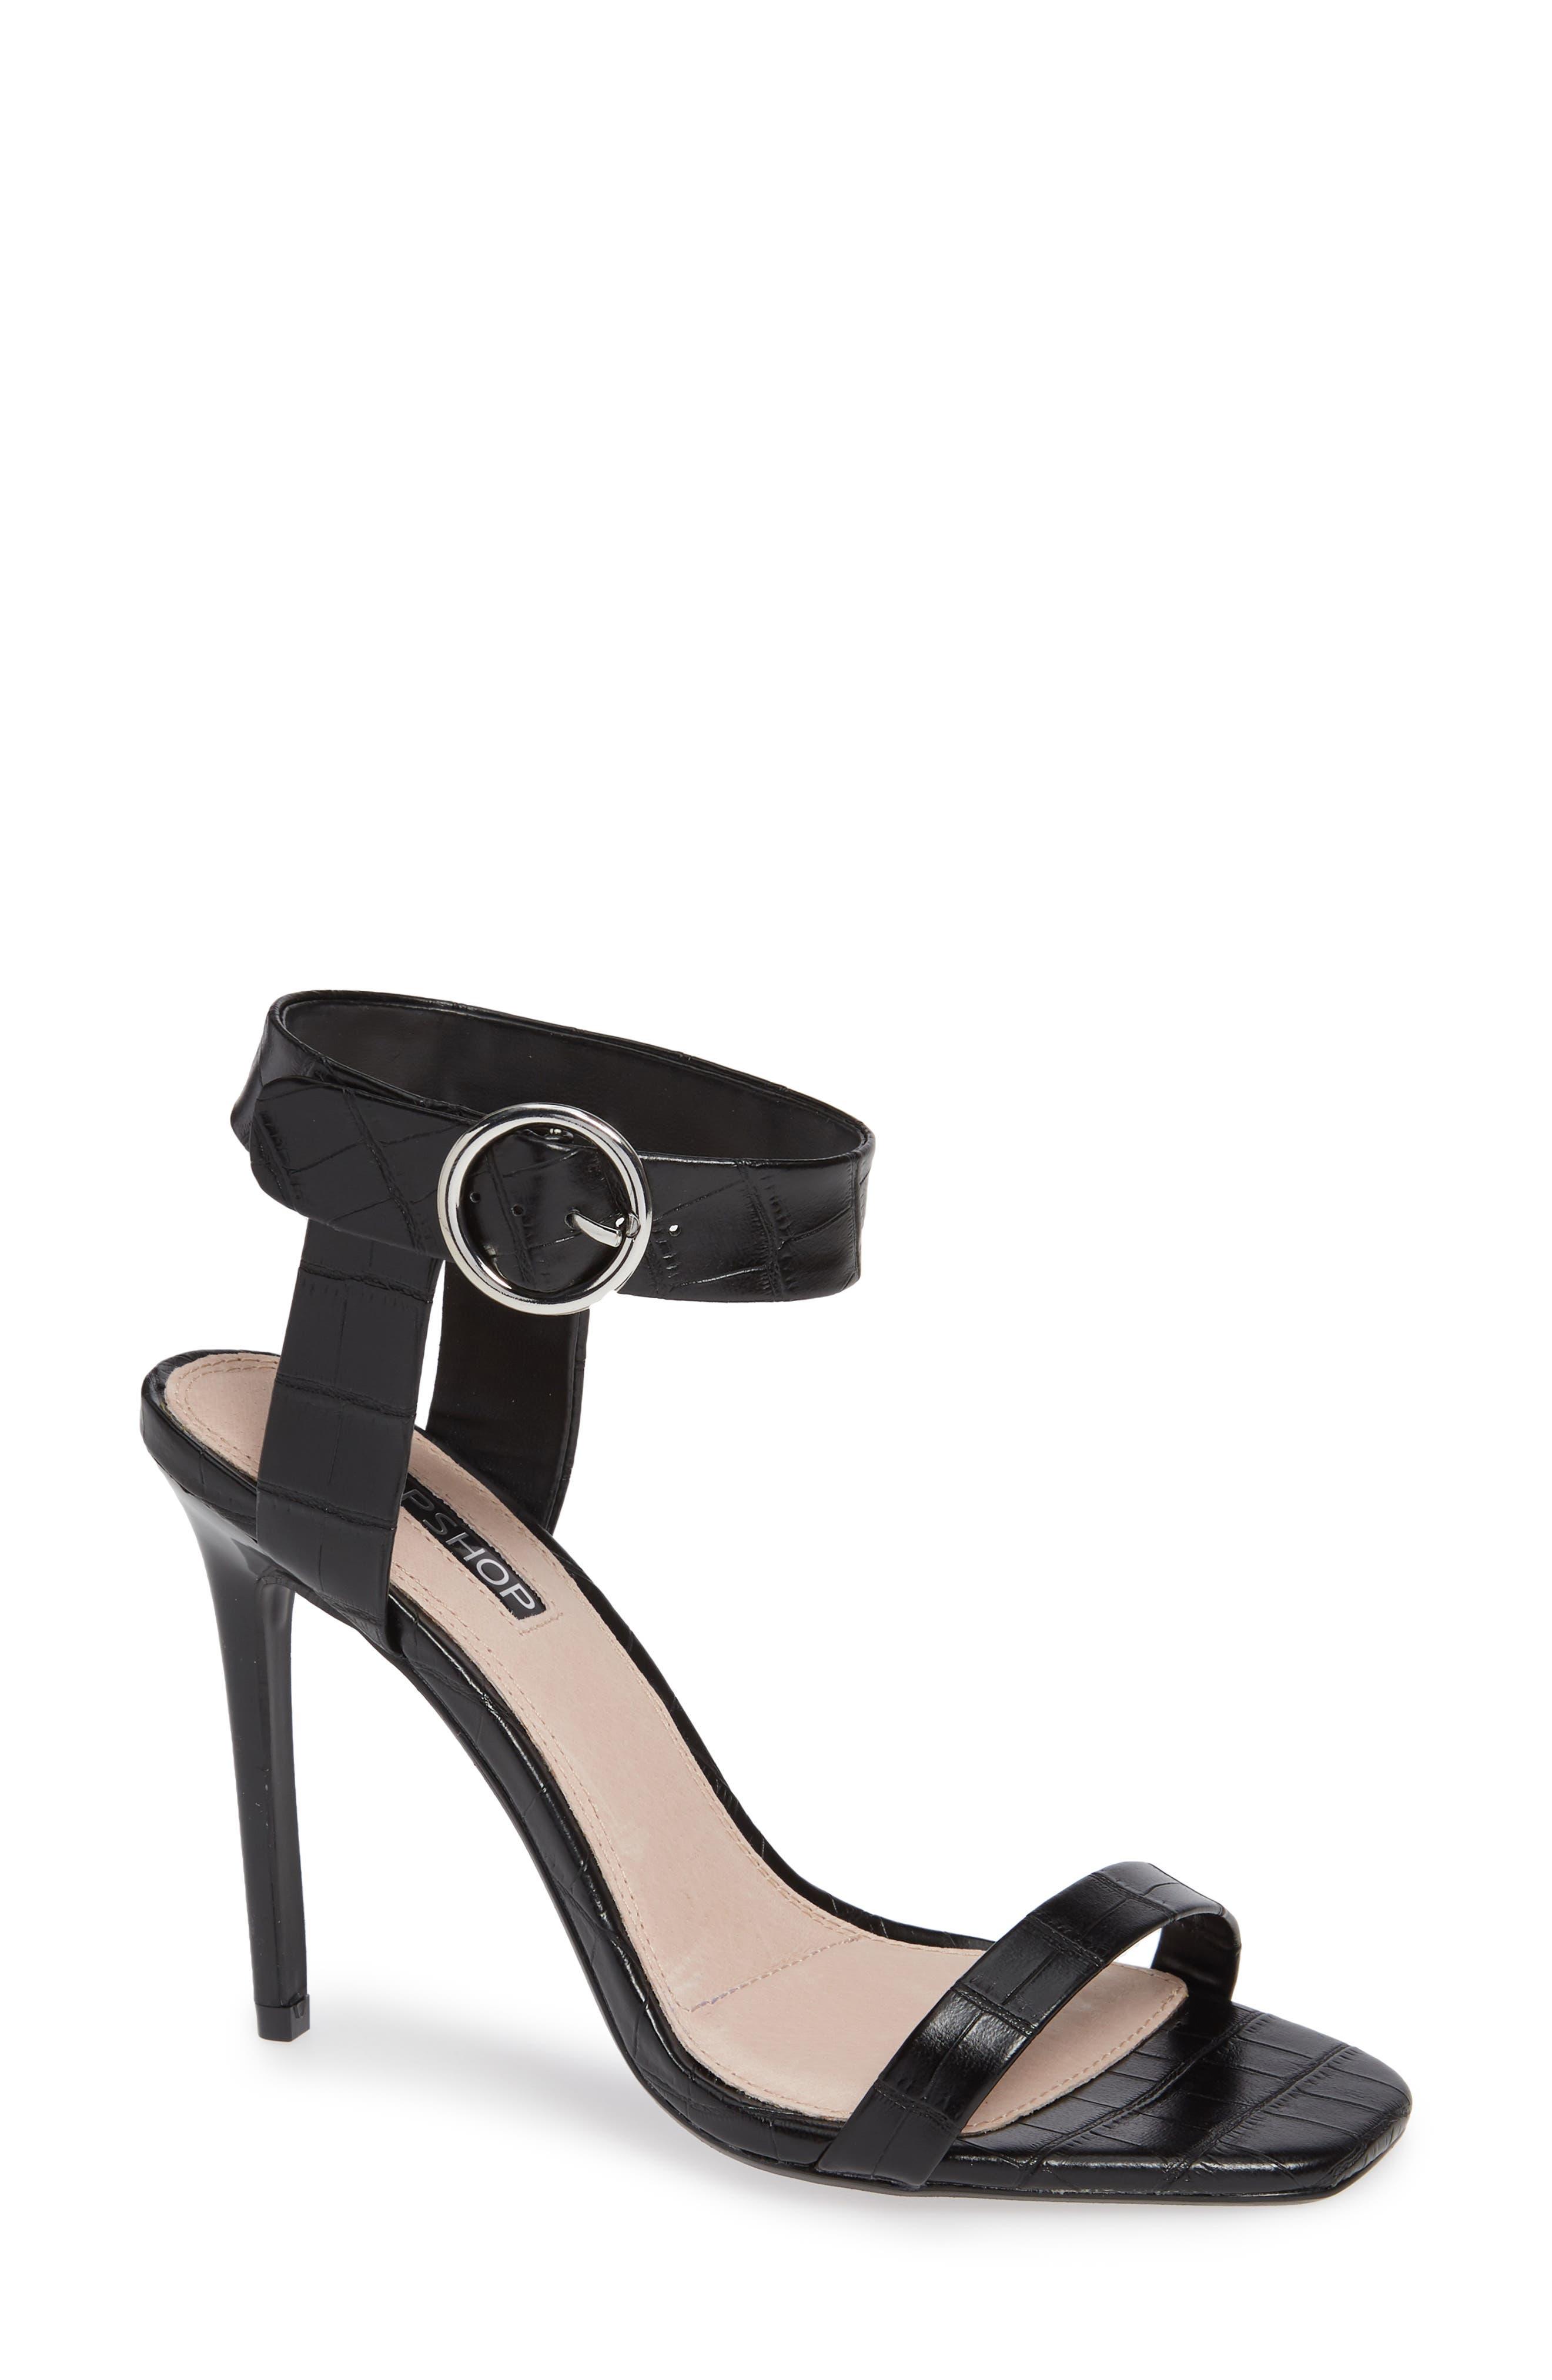 Ria Ankle Cuff Sandal,                             Main thumbnail 1, color,                             BLACK